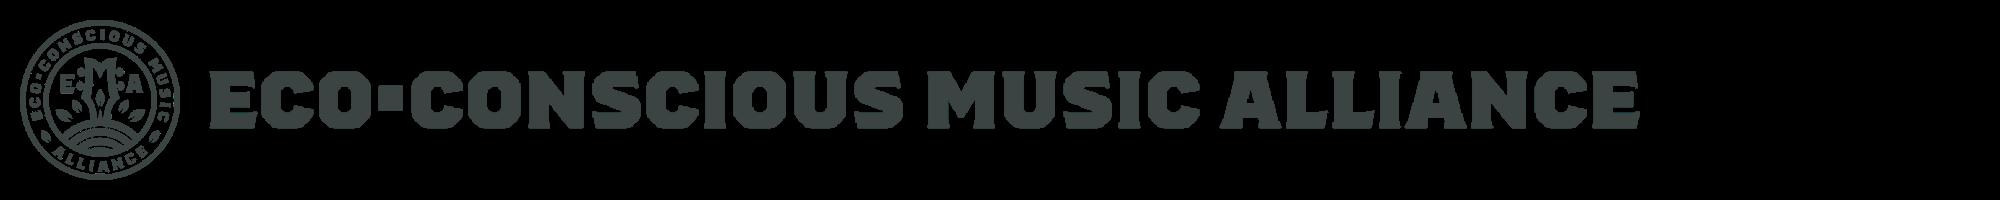 The Eco-conscious Music Alliance (EMA)